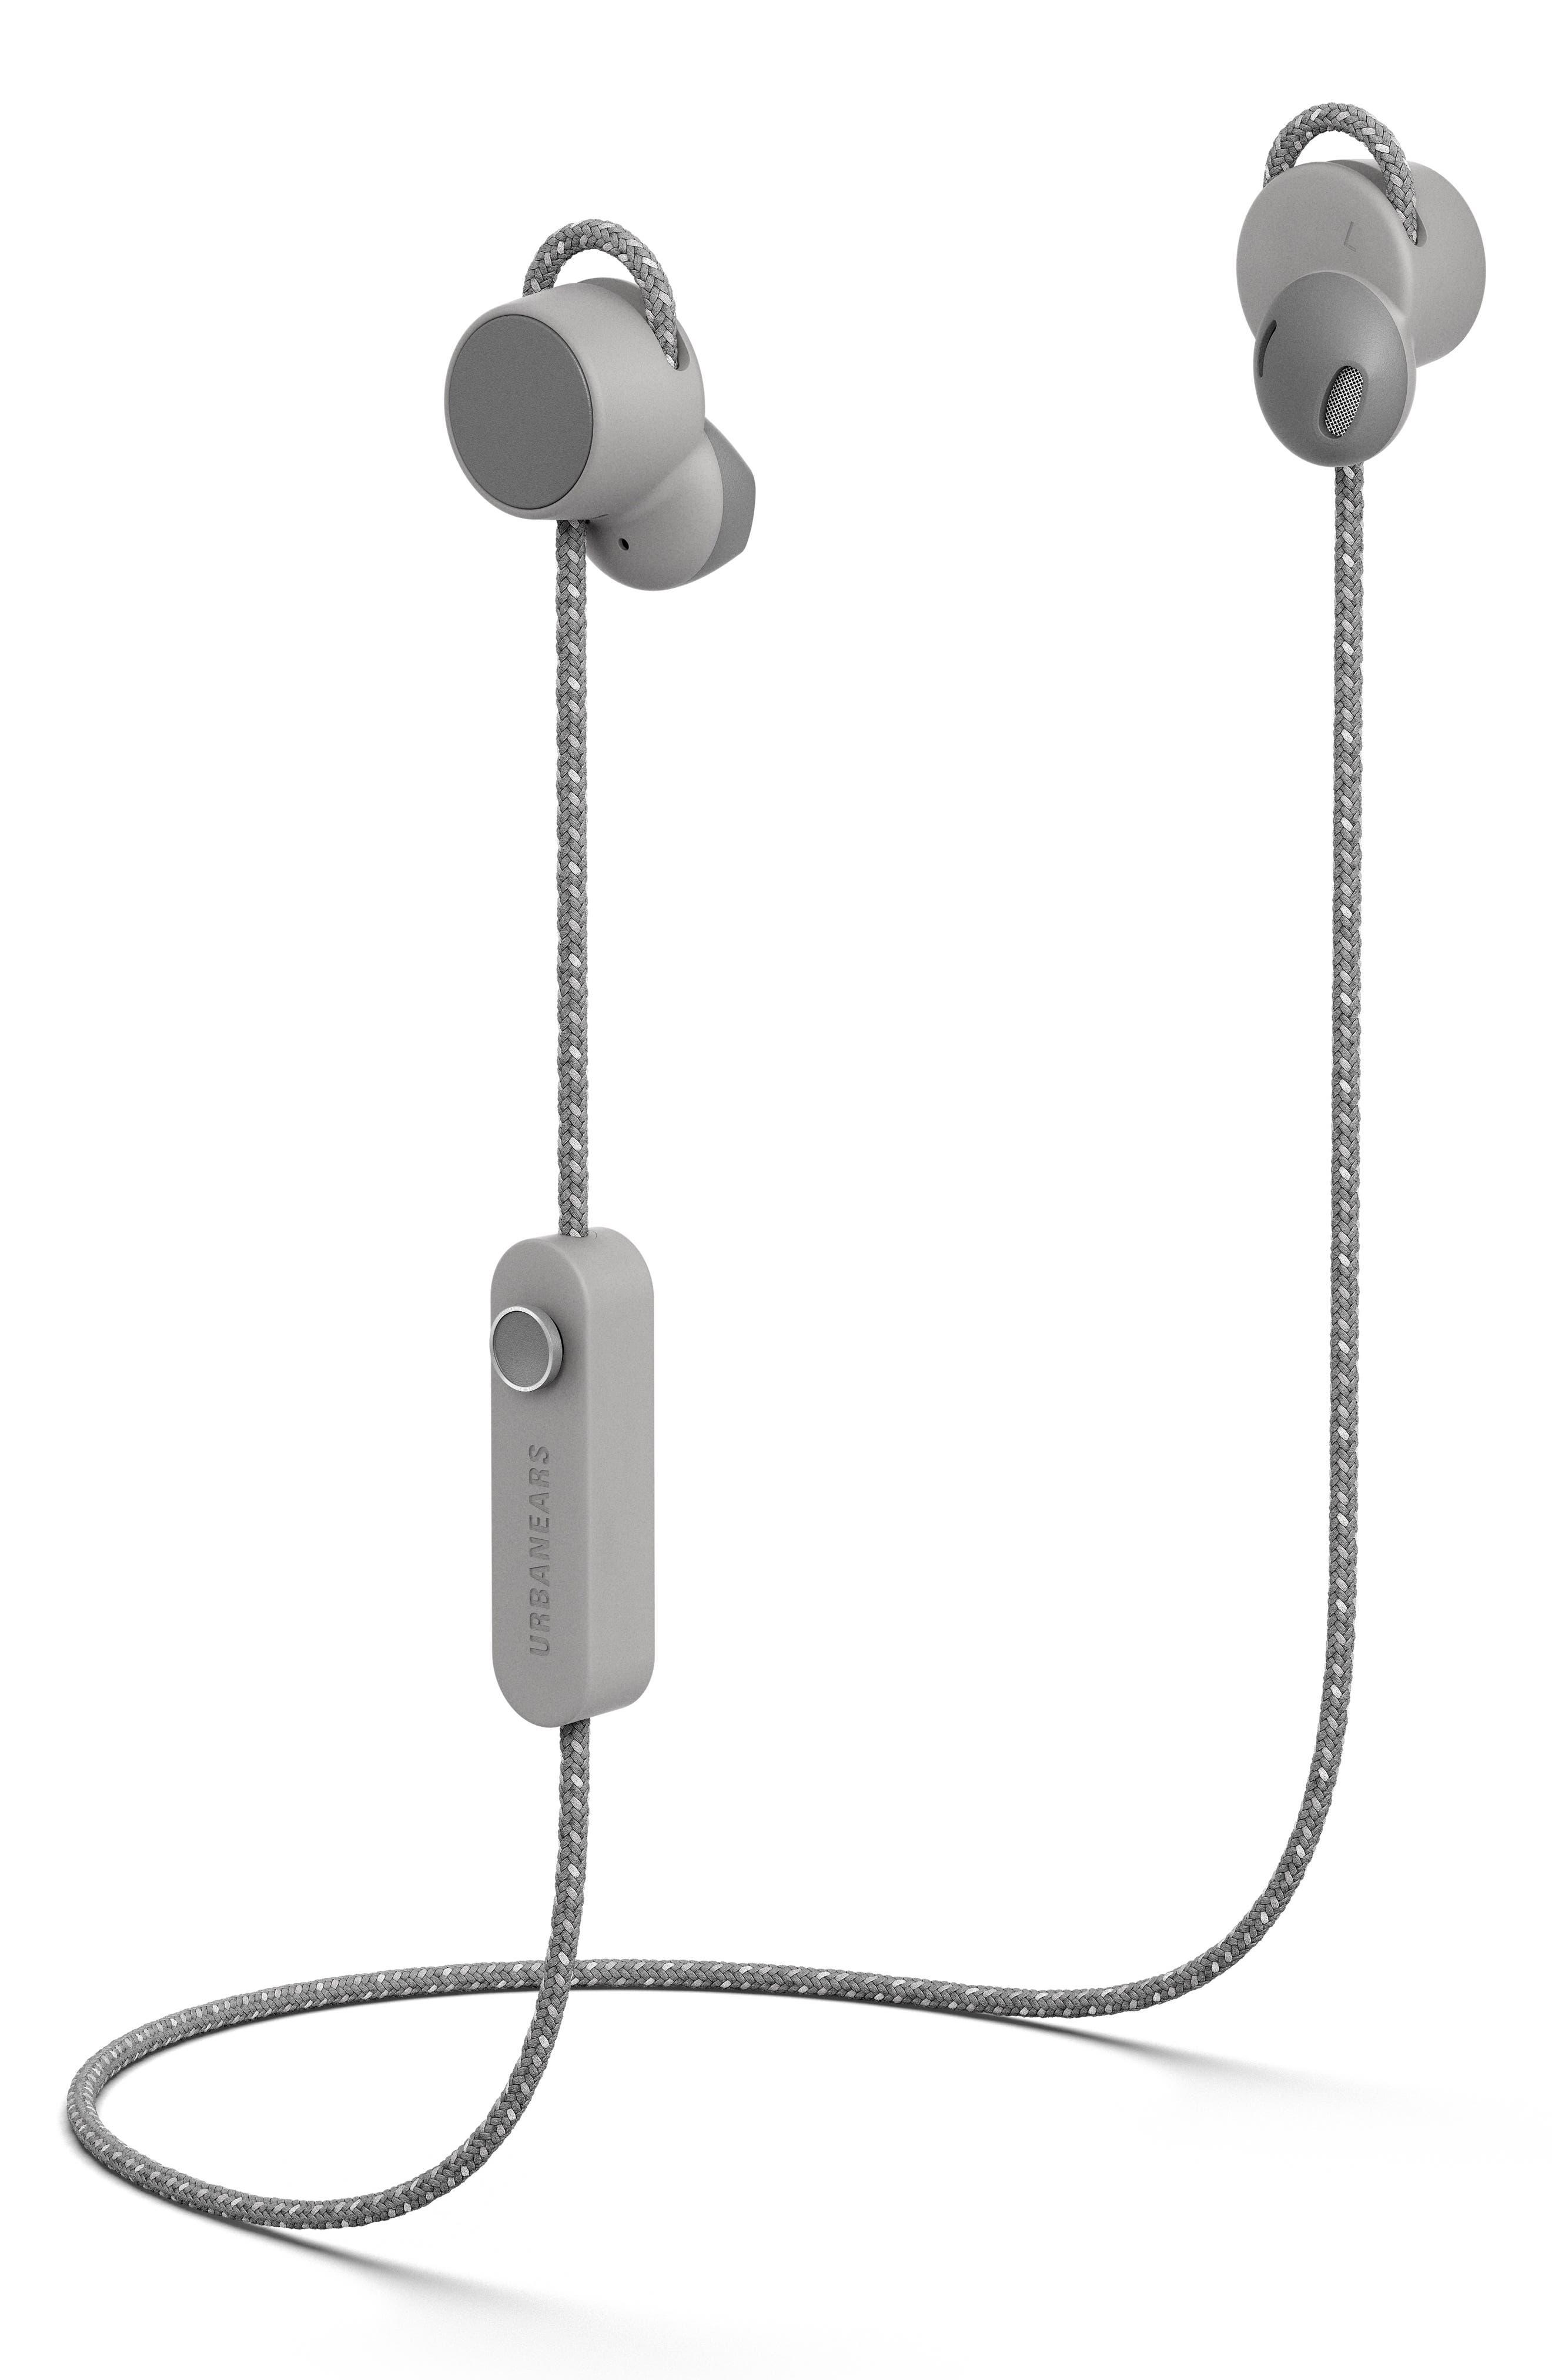 Urbanears Phone Cases Headphones Nordstrom Plattan Ii Powder Pink